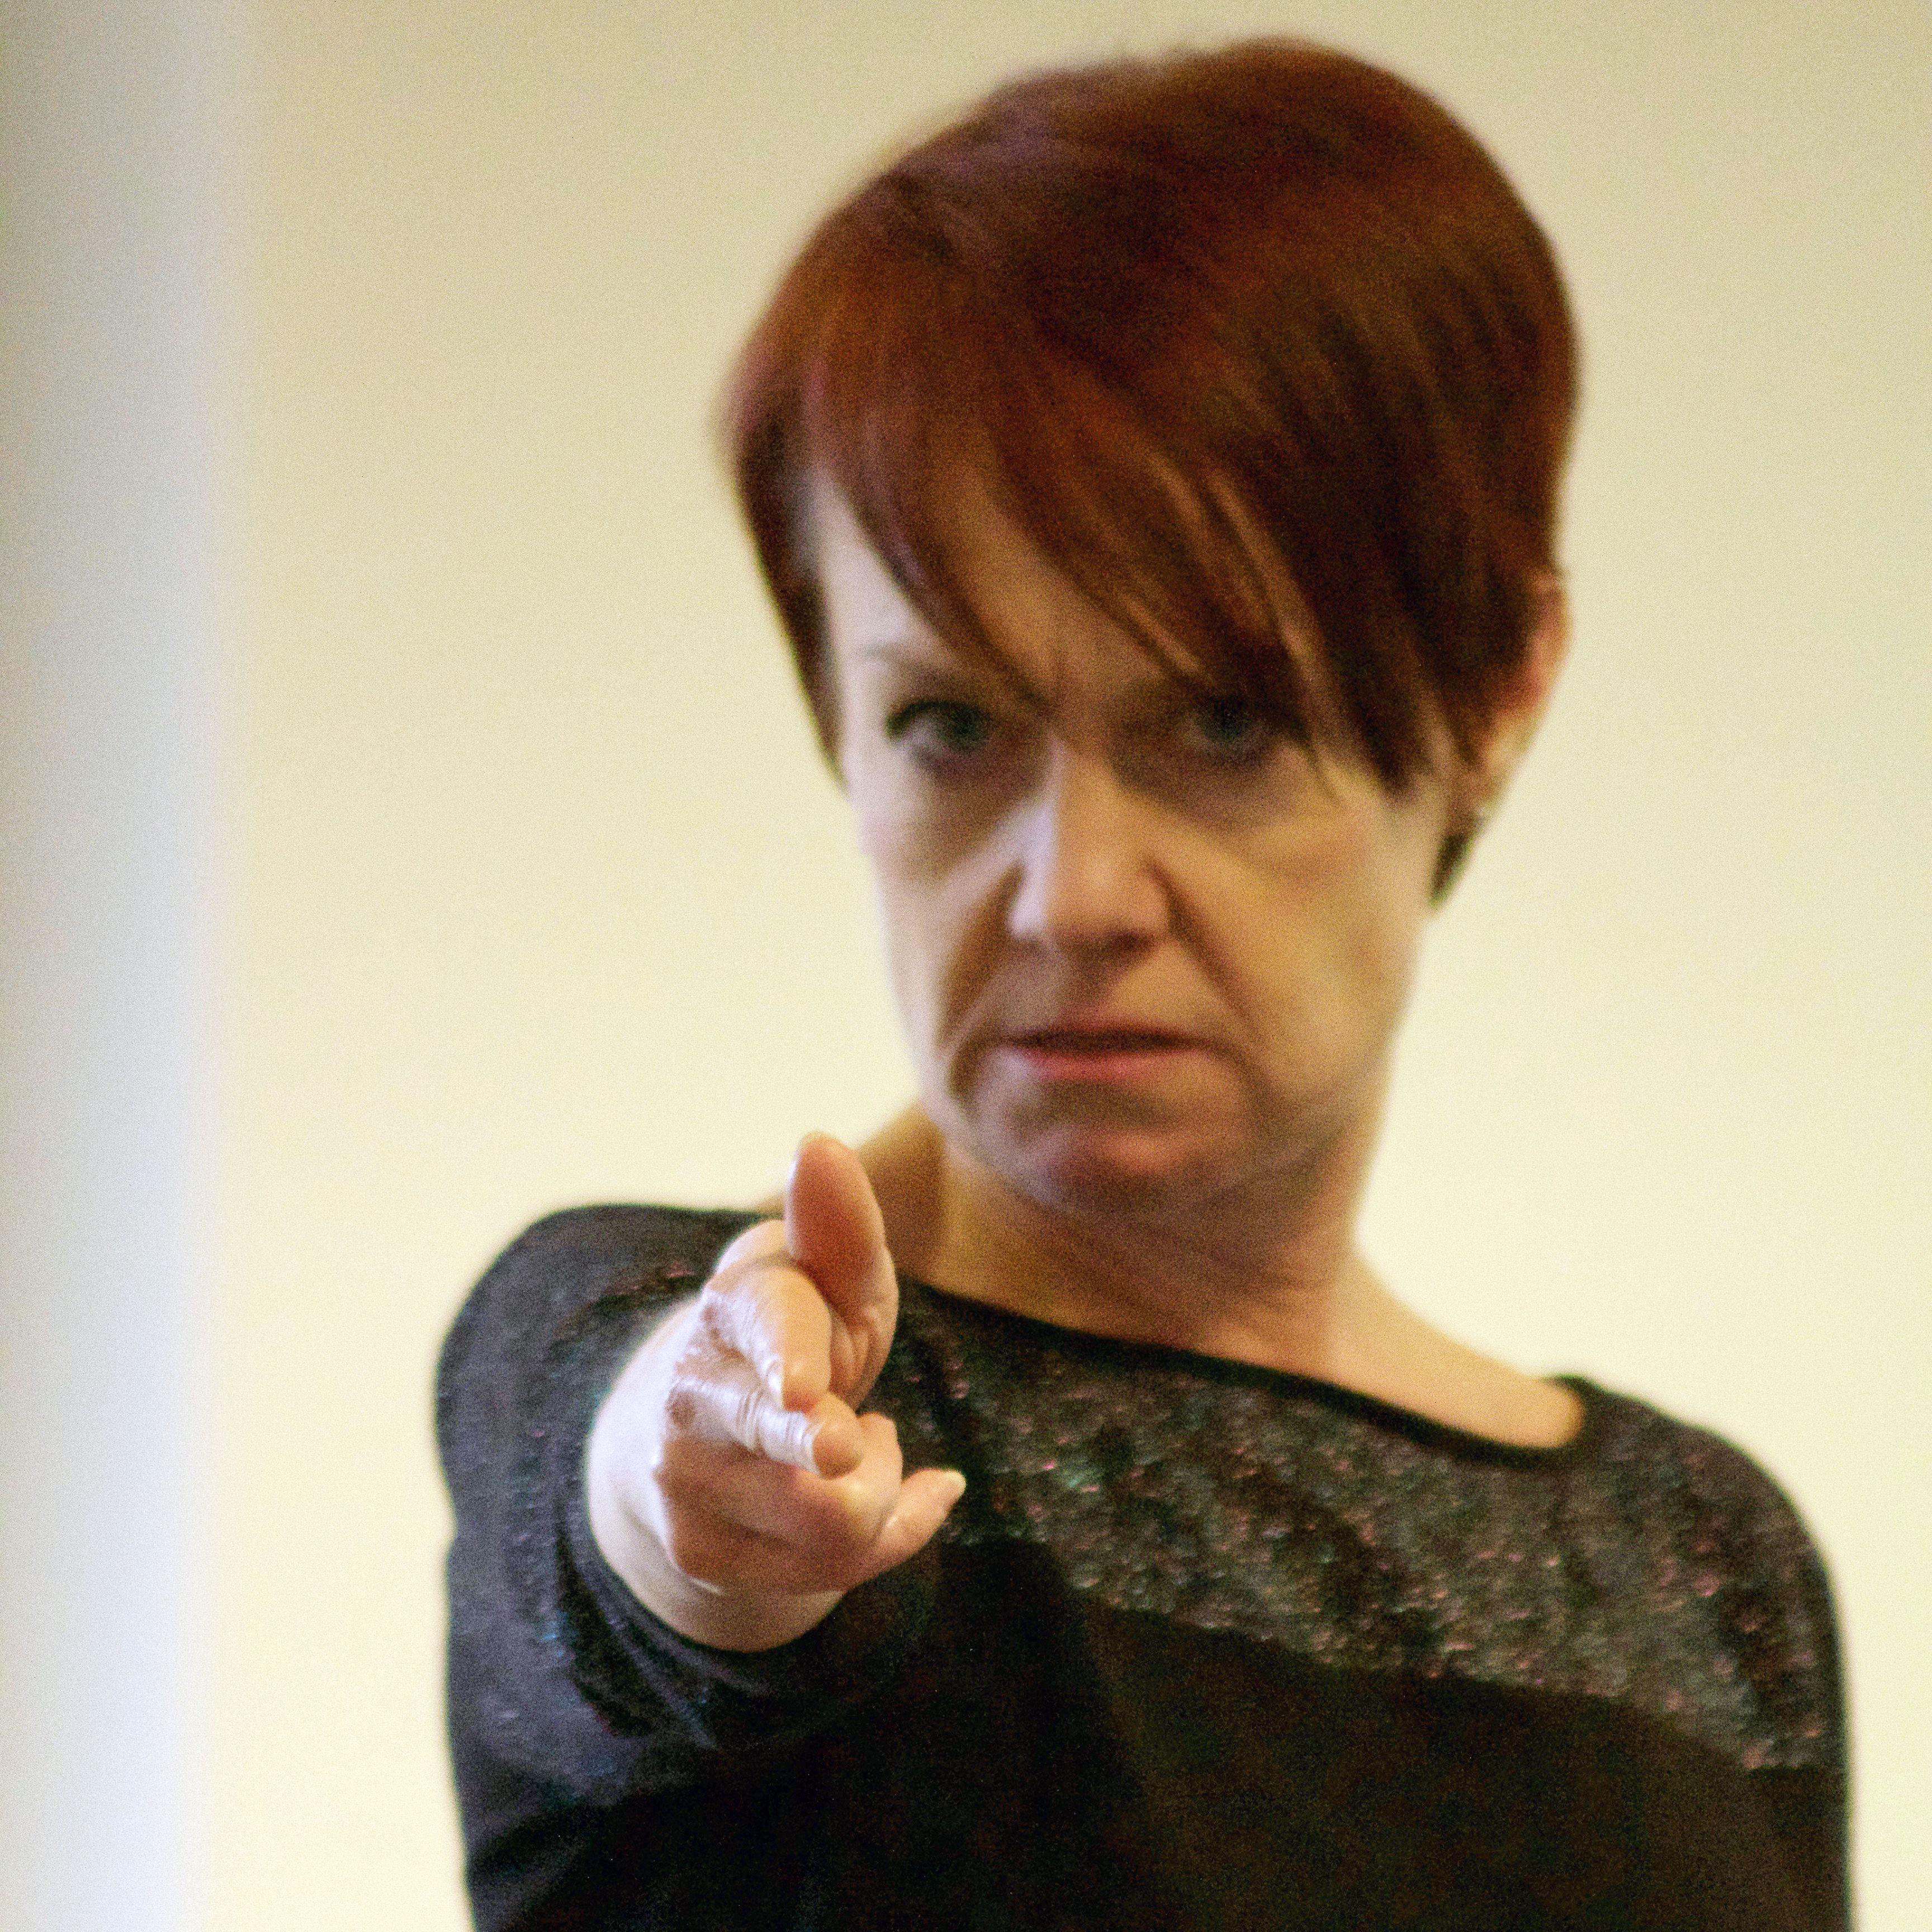 Revenge - Kate Ashmead in rehearsals